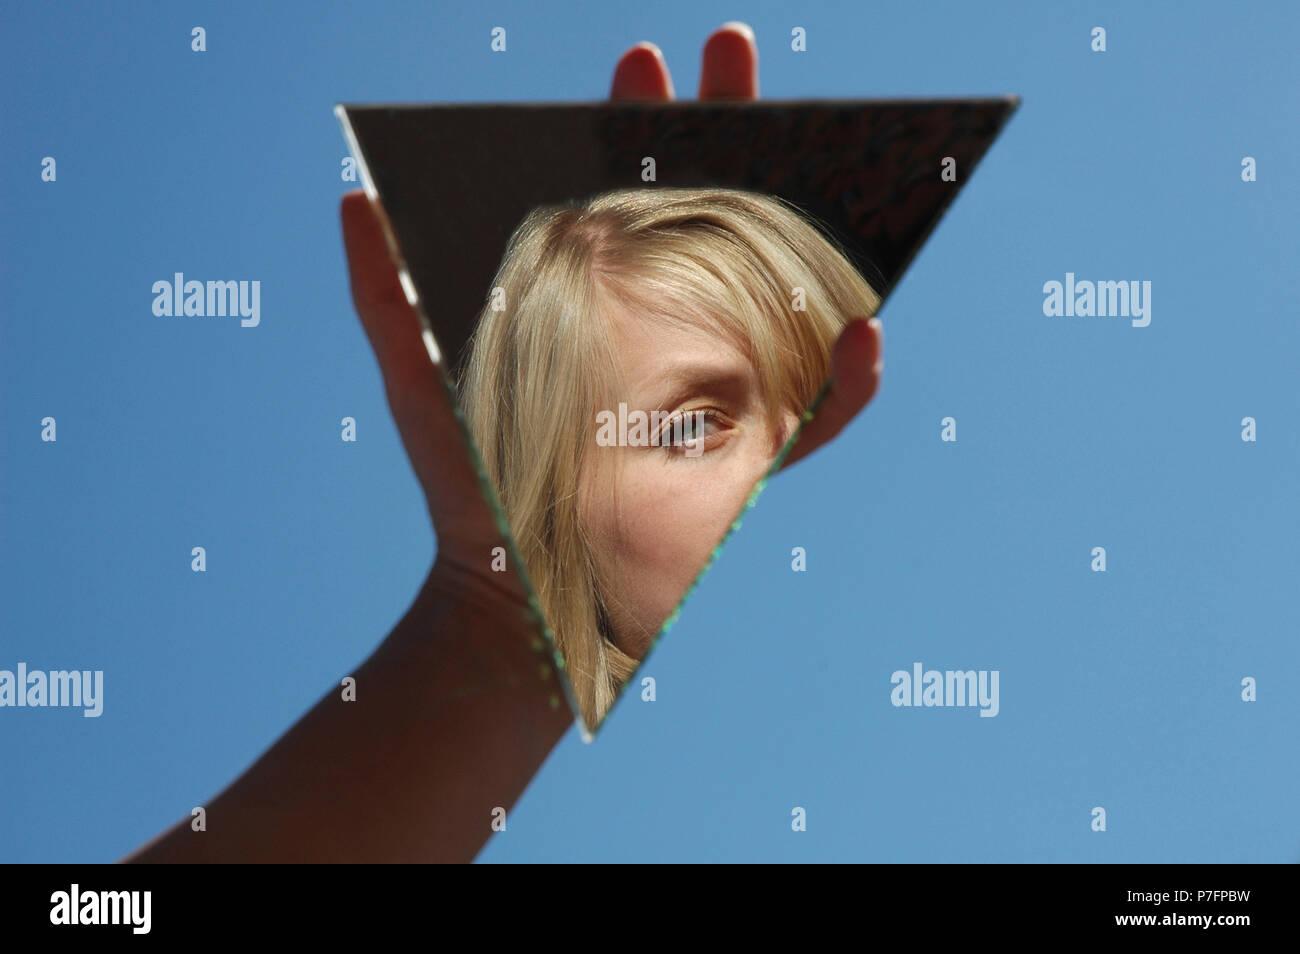 Identity crisis, Woman reflected, Germany - Stock Image